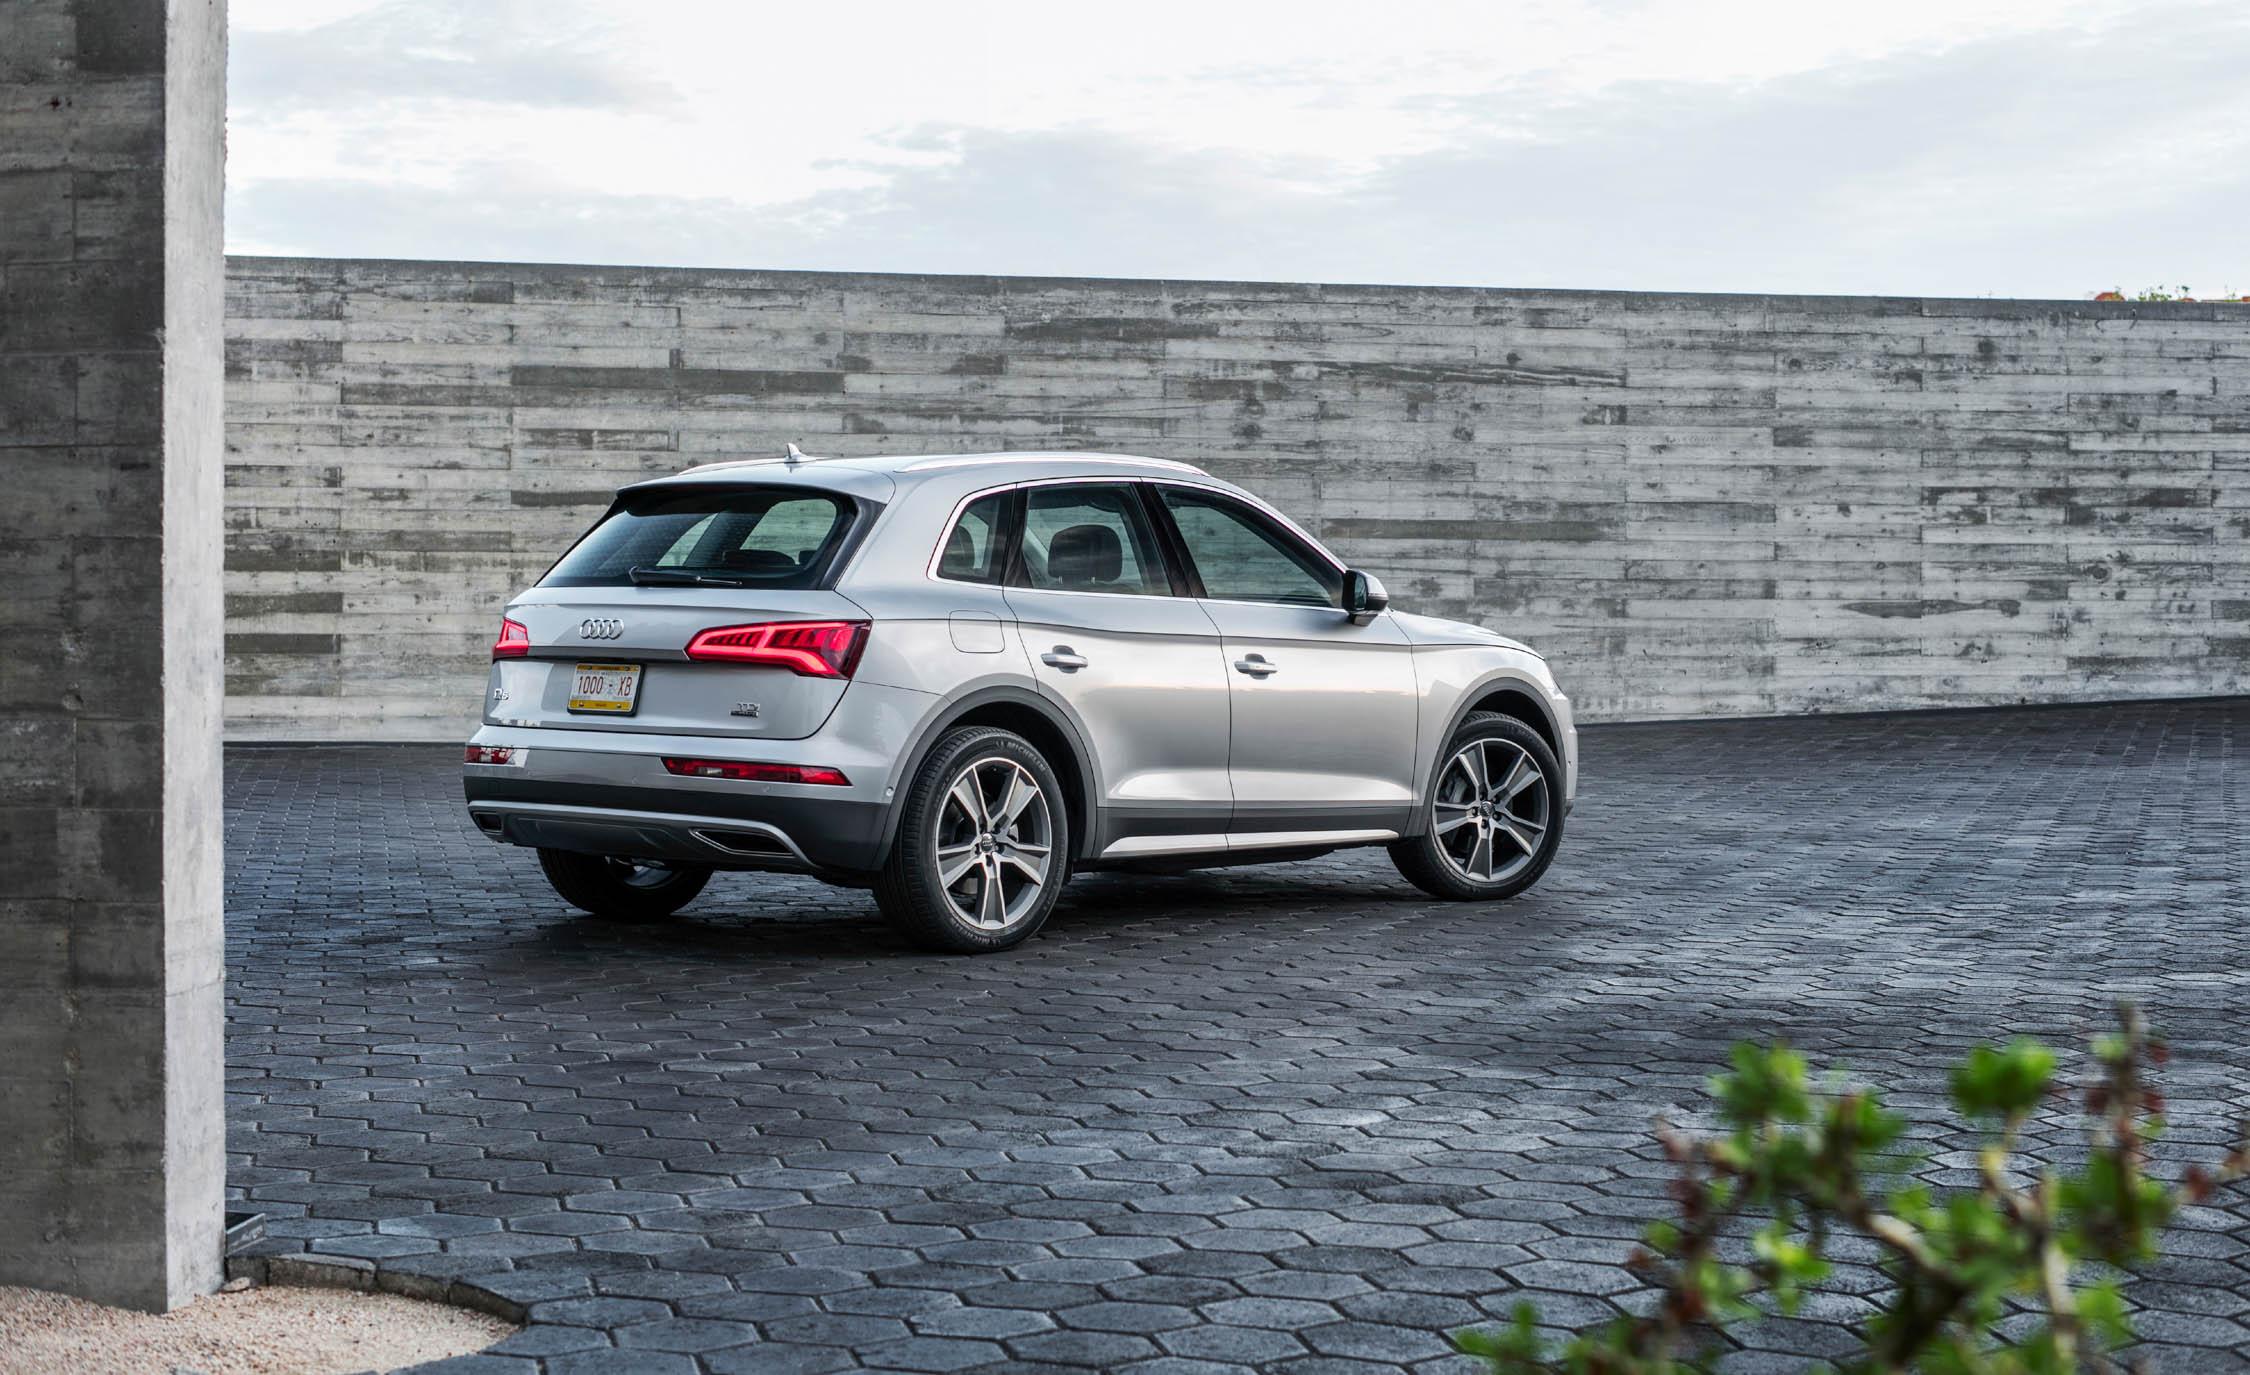 2018 Audi Q (View 2 of 40)